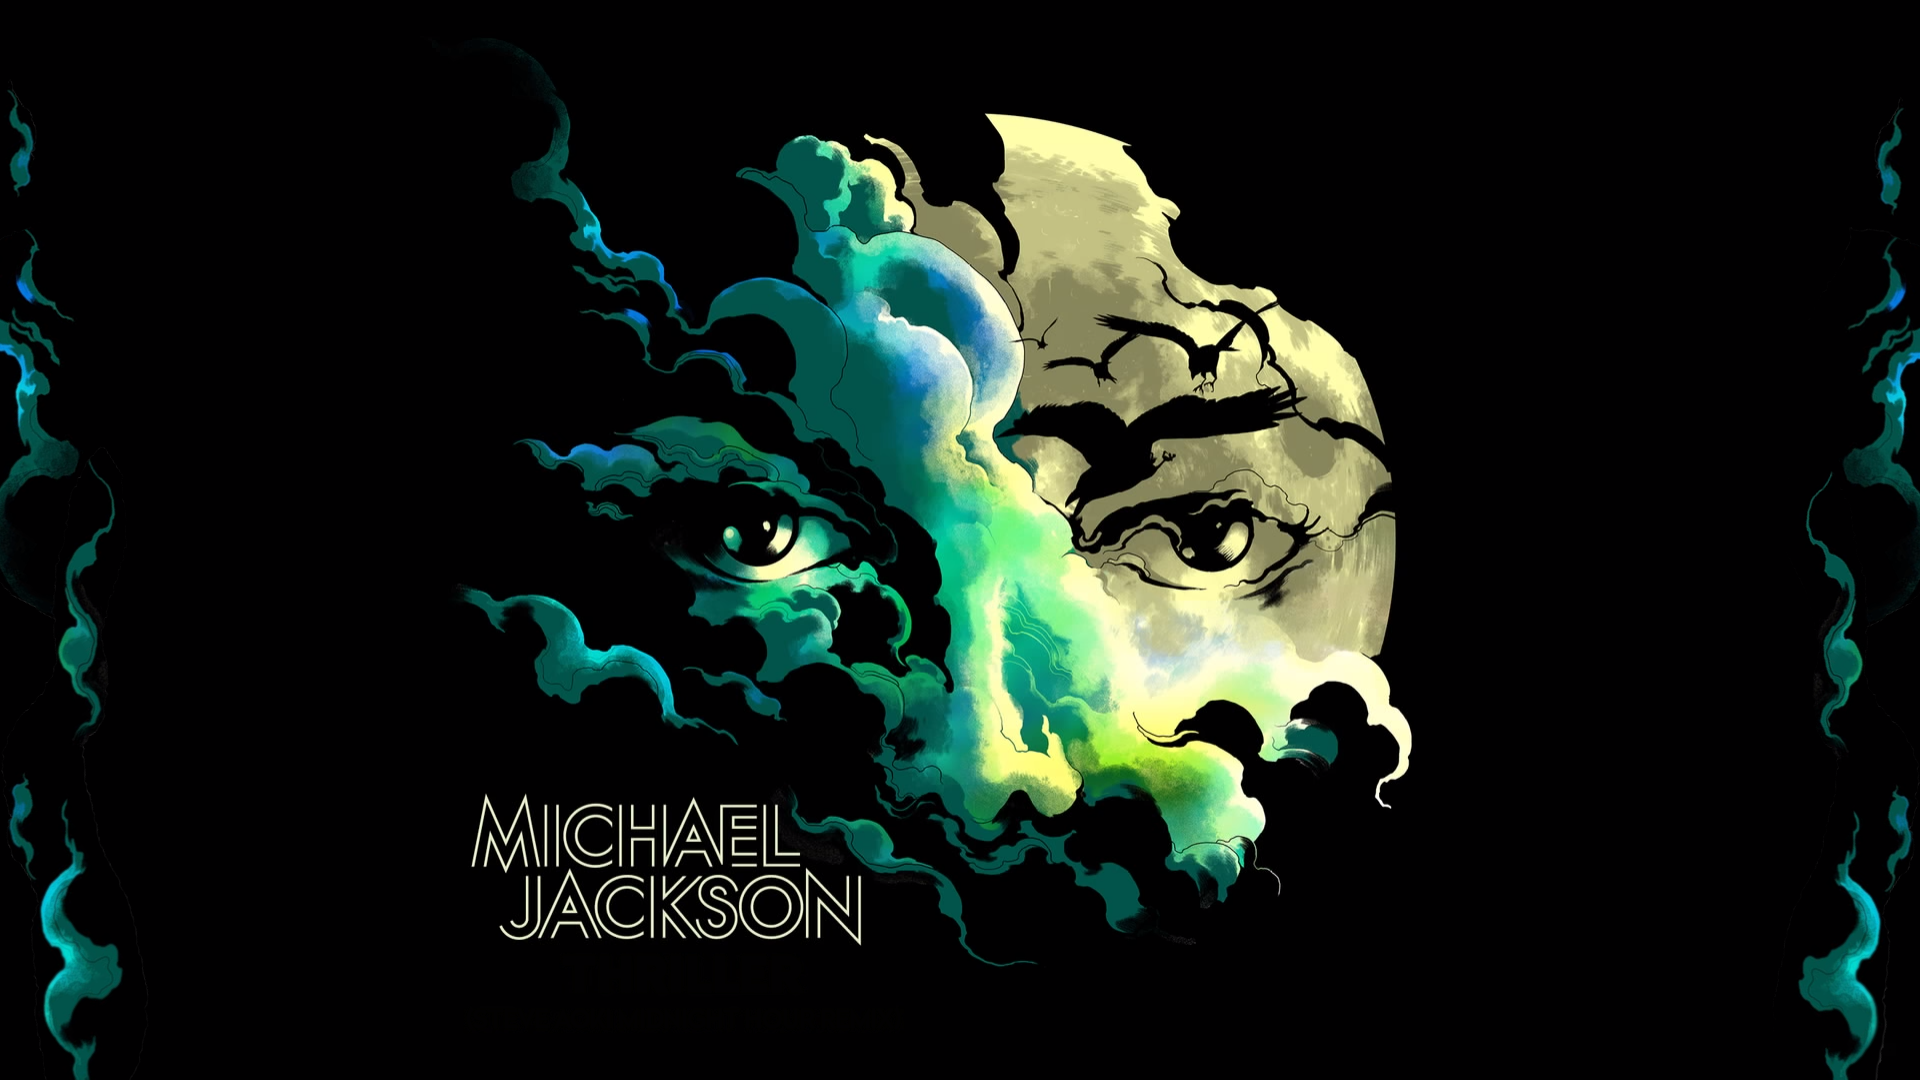 Michael Jackson Scream 2017 Hd Wallpaper Background Image